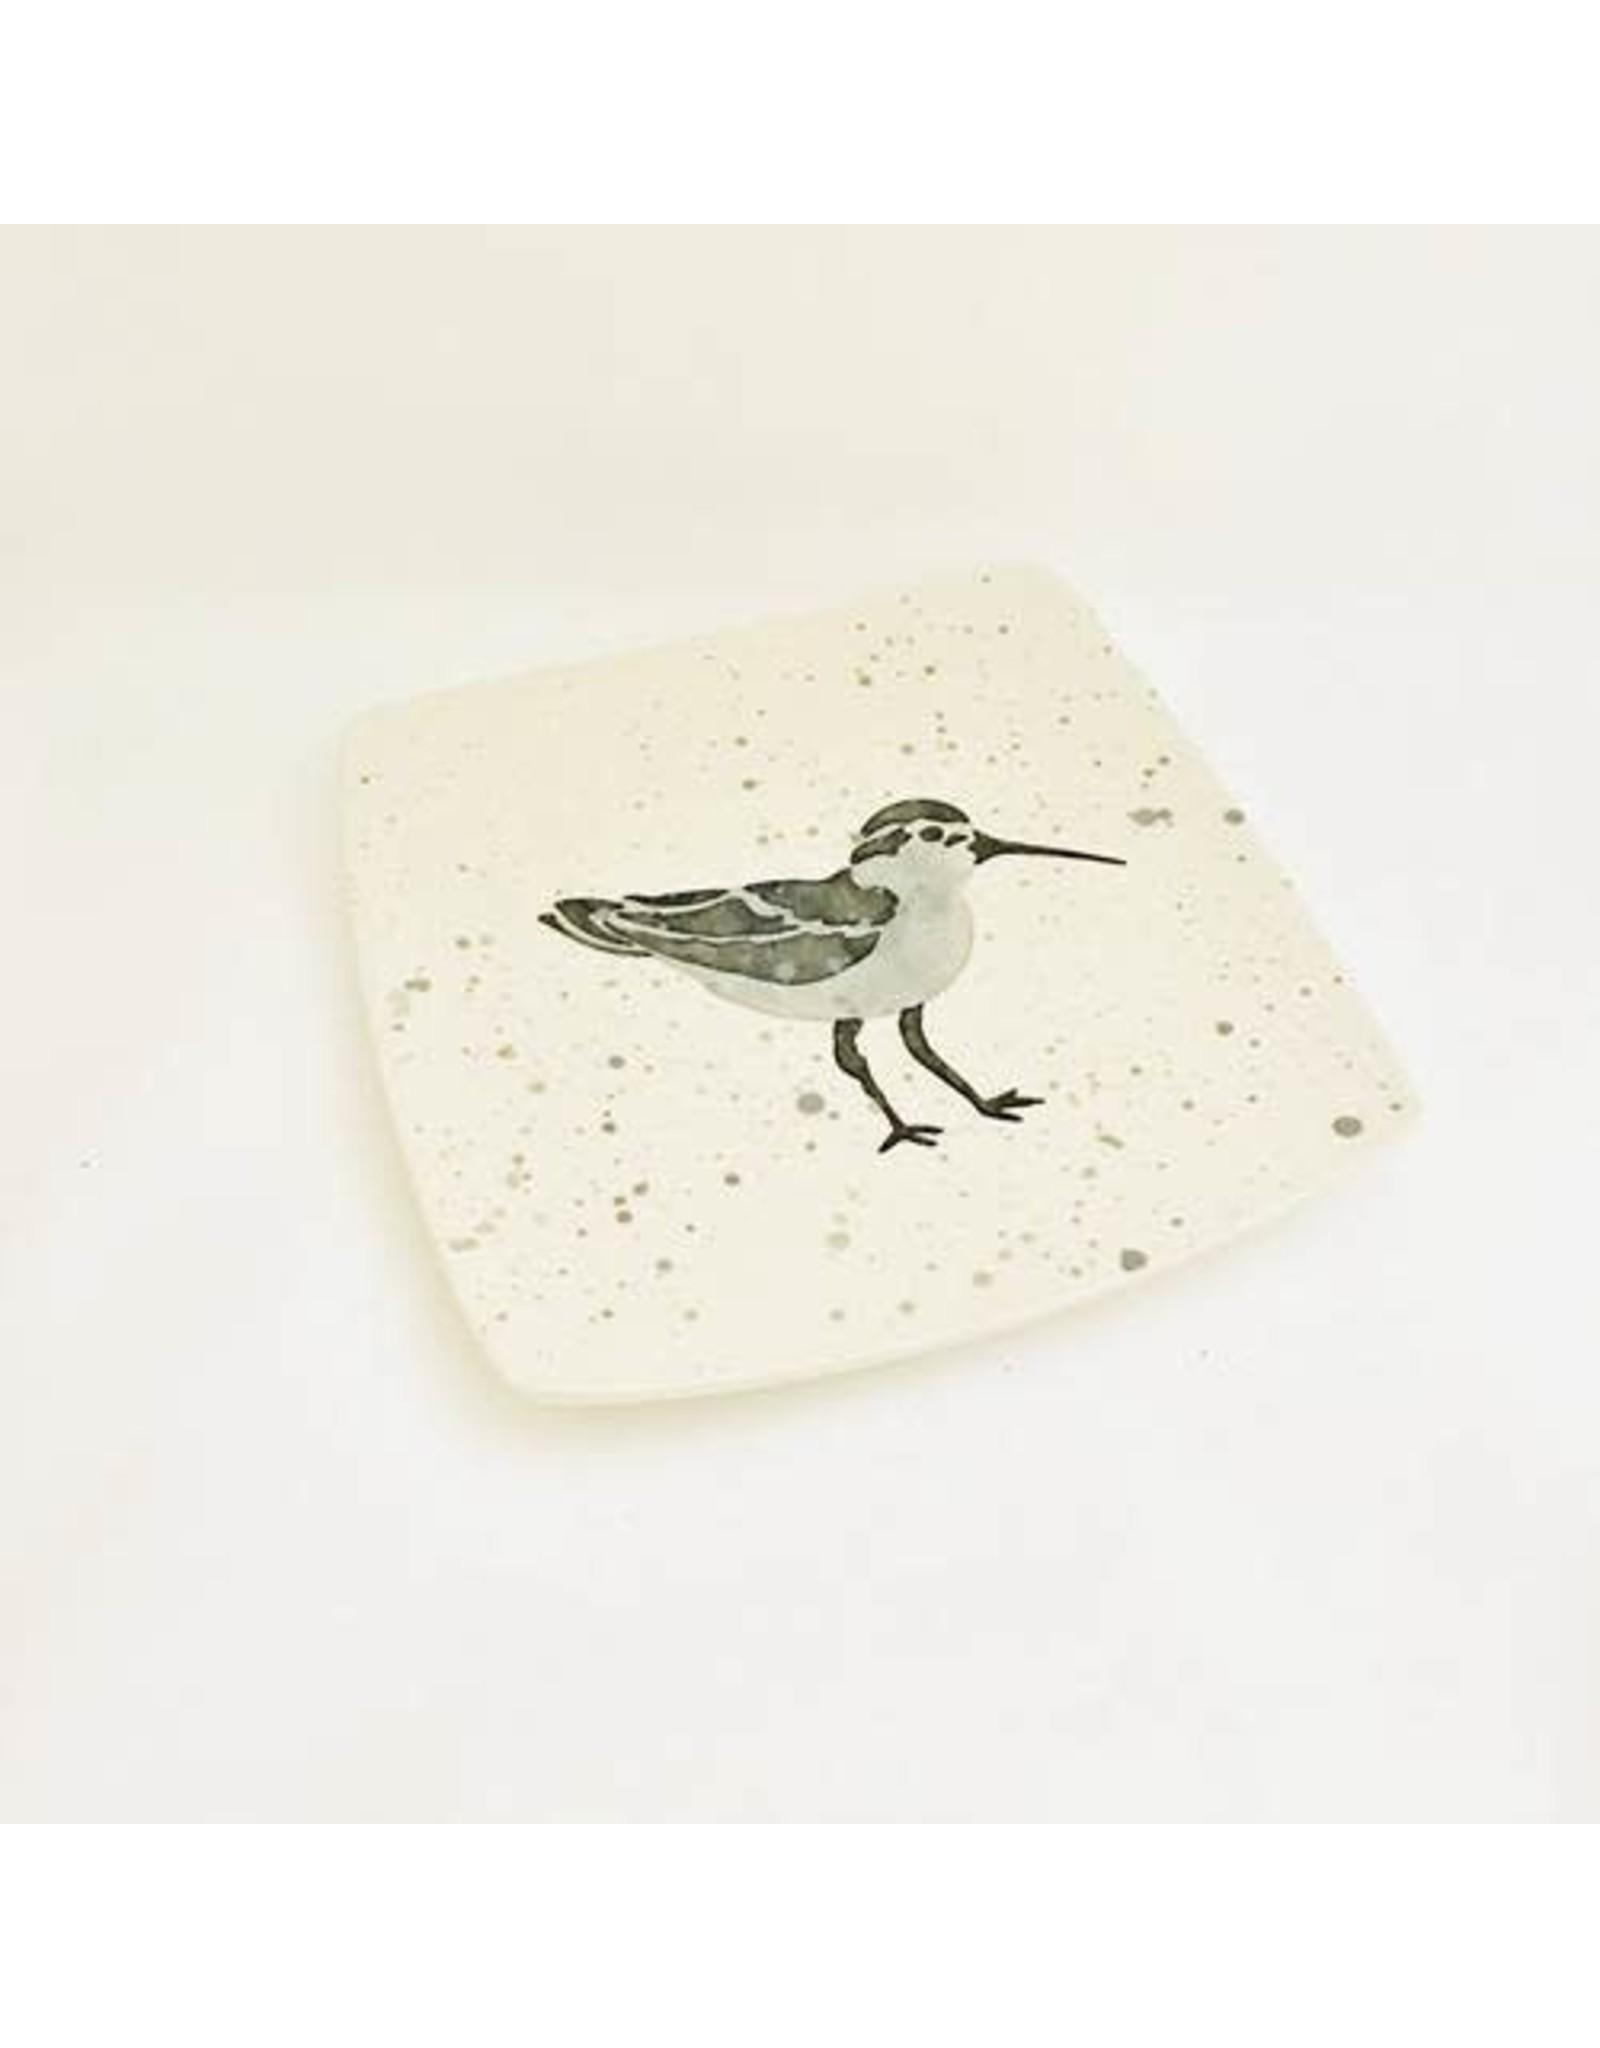 "Sara Hunter PLATE (Shore Bird, 8.5""SQ., SARH)"